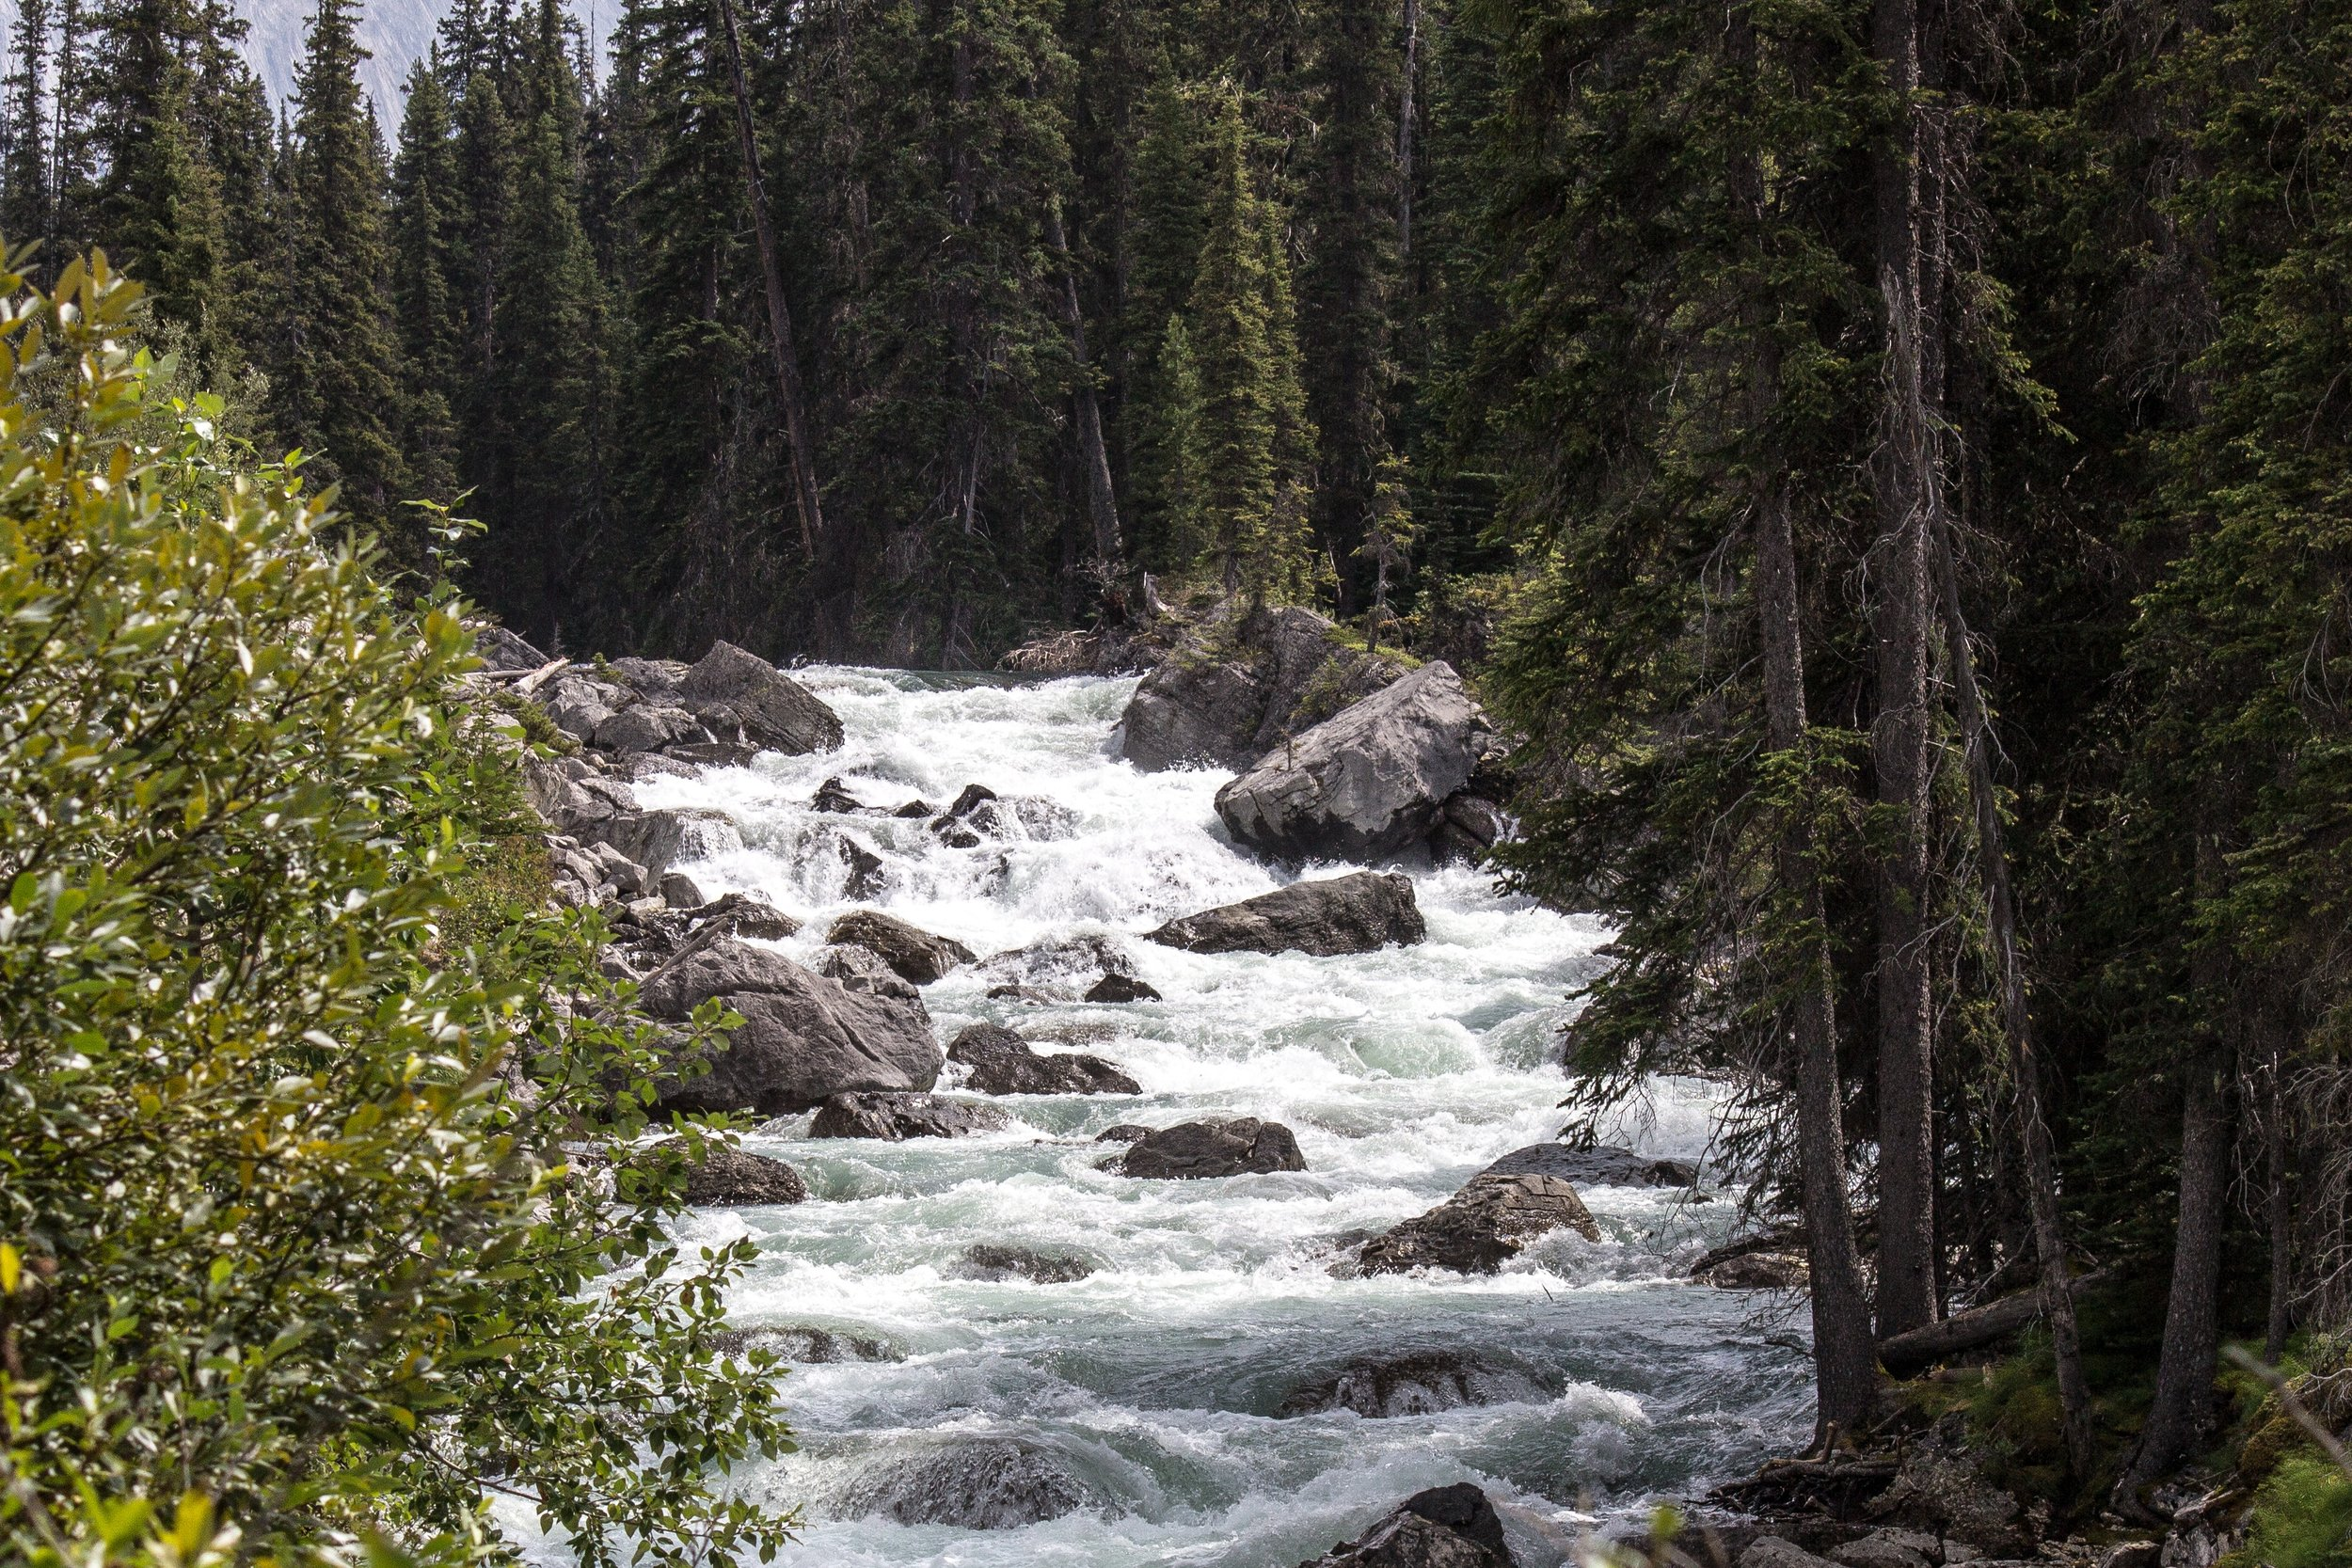 maligne-river-jasper-alberta-canada-161699.jpeg